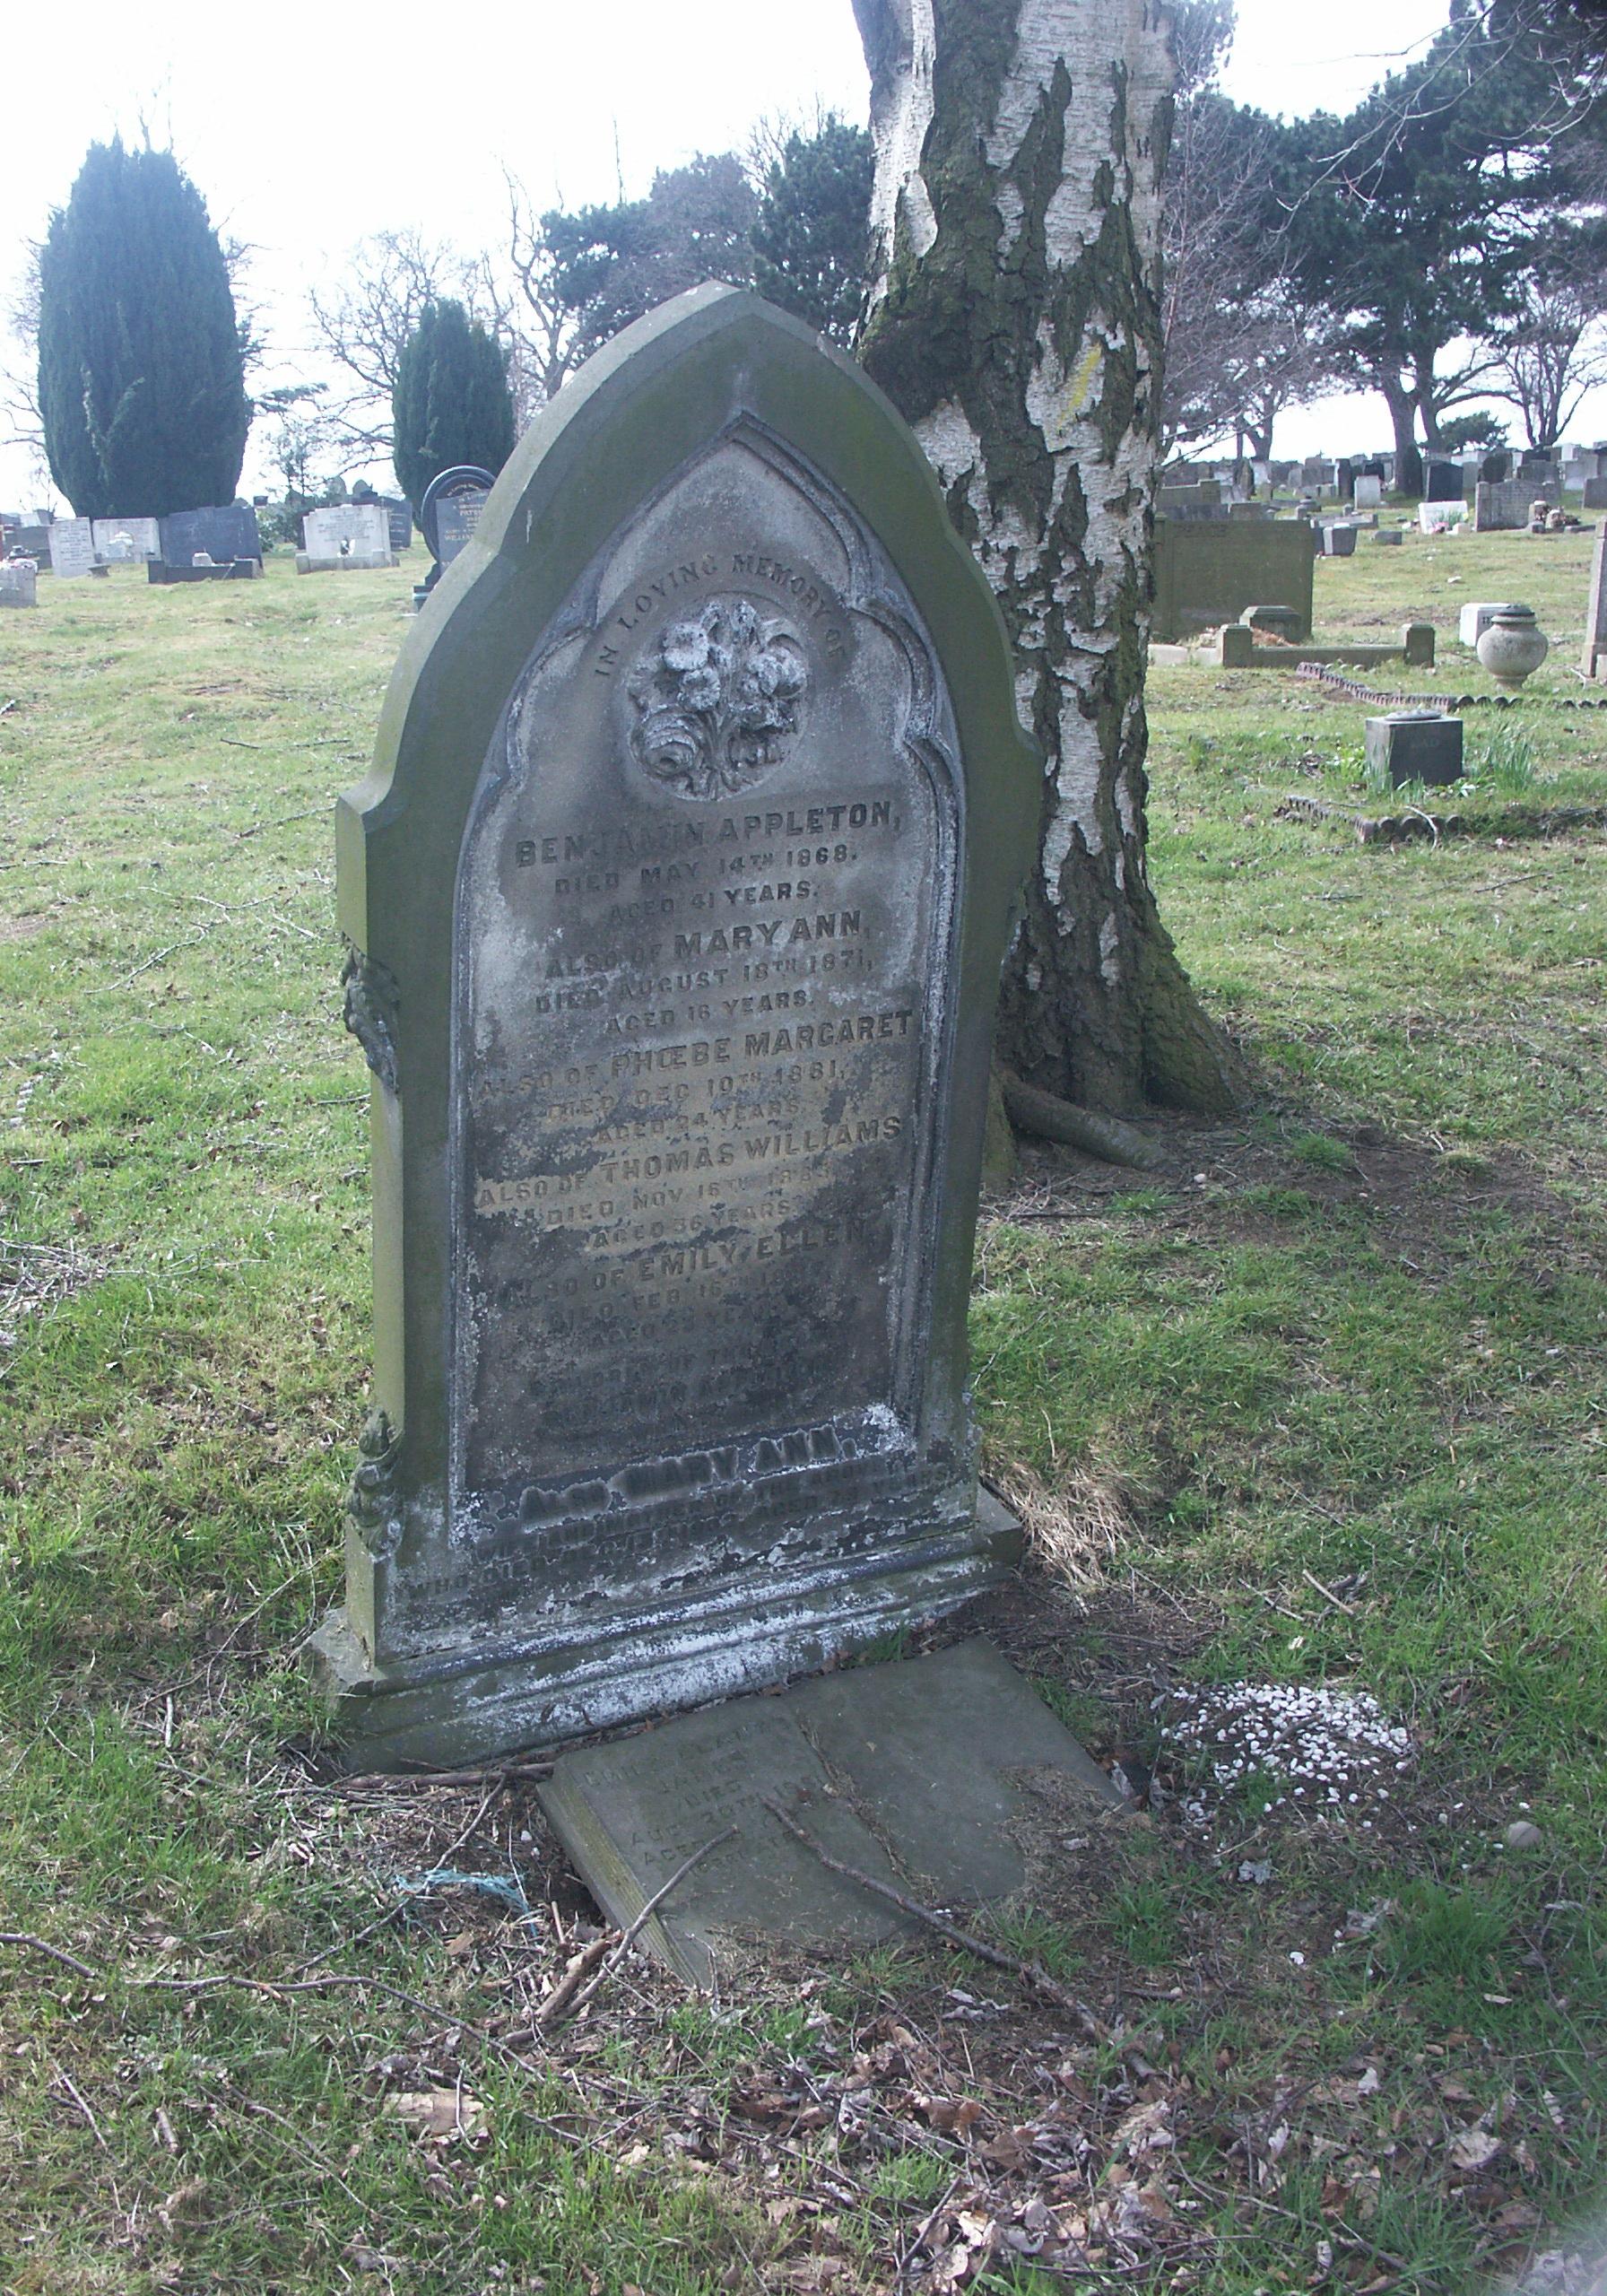 Phoebe Margaret Appleton